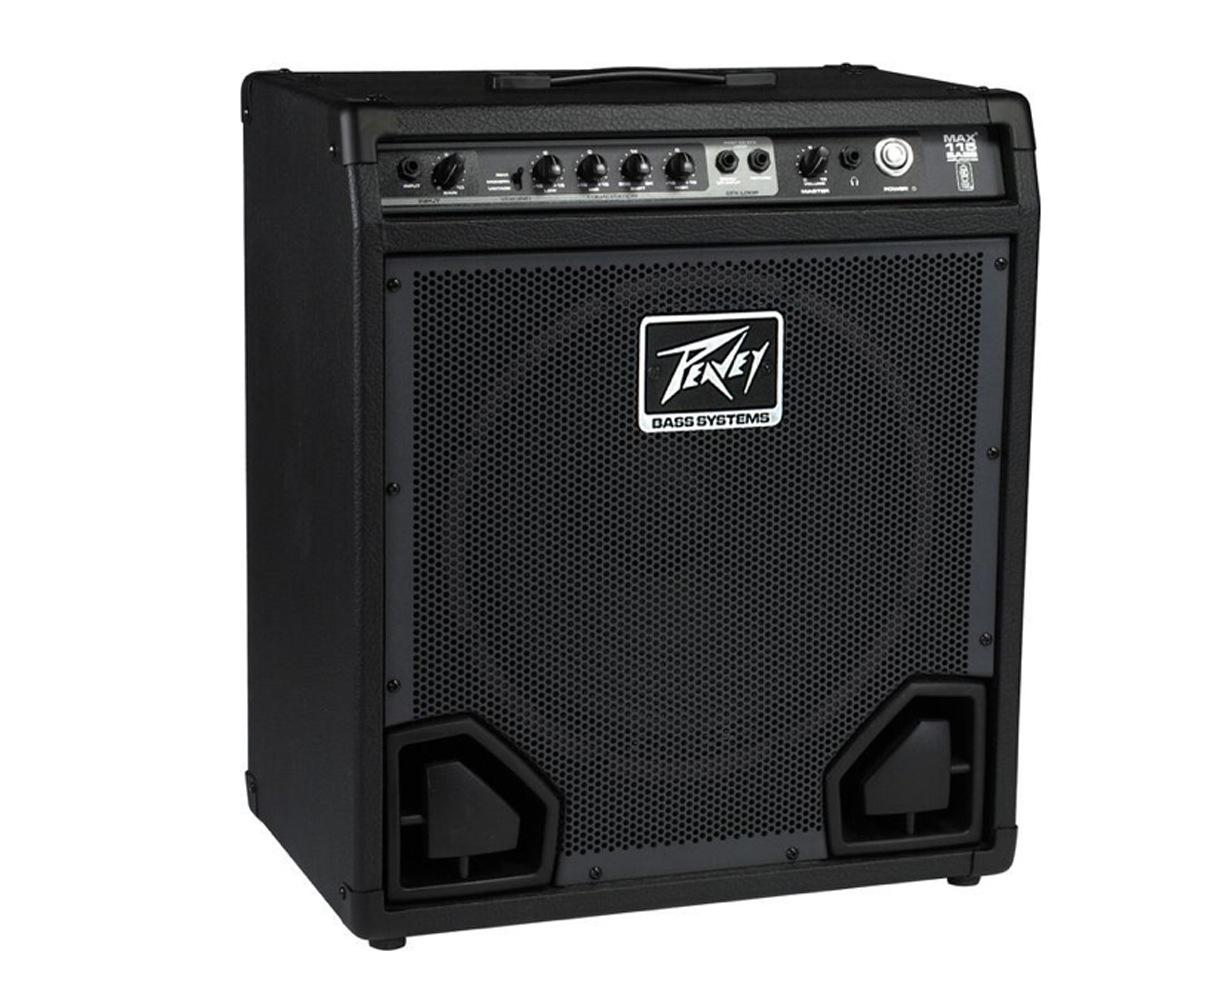 peavey max115 max 115 bass combo amplifier proaudiostar b nb ebay. Black Bedroom Furniture Sets. Home Design Ideas